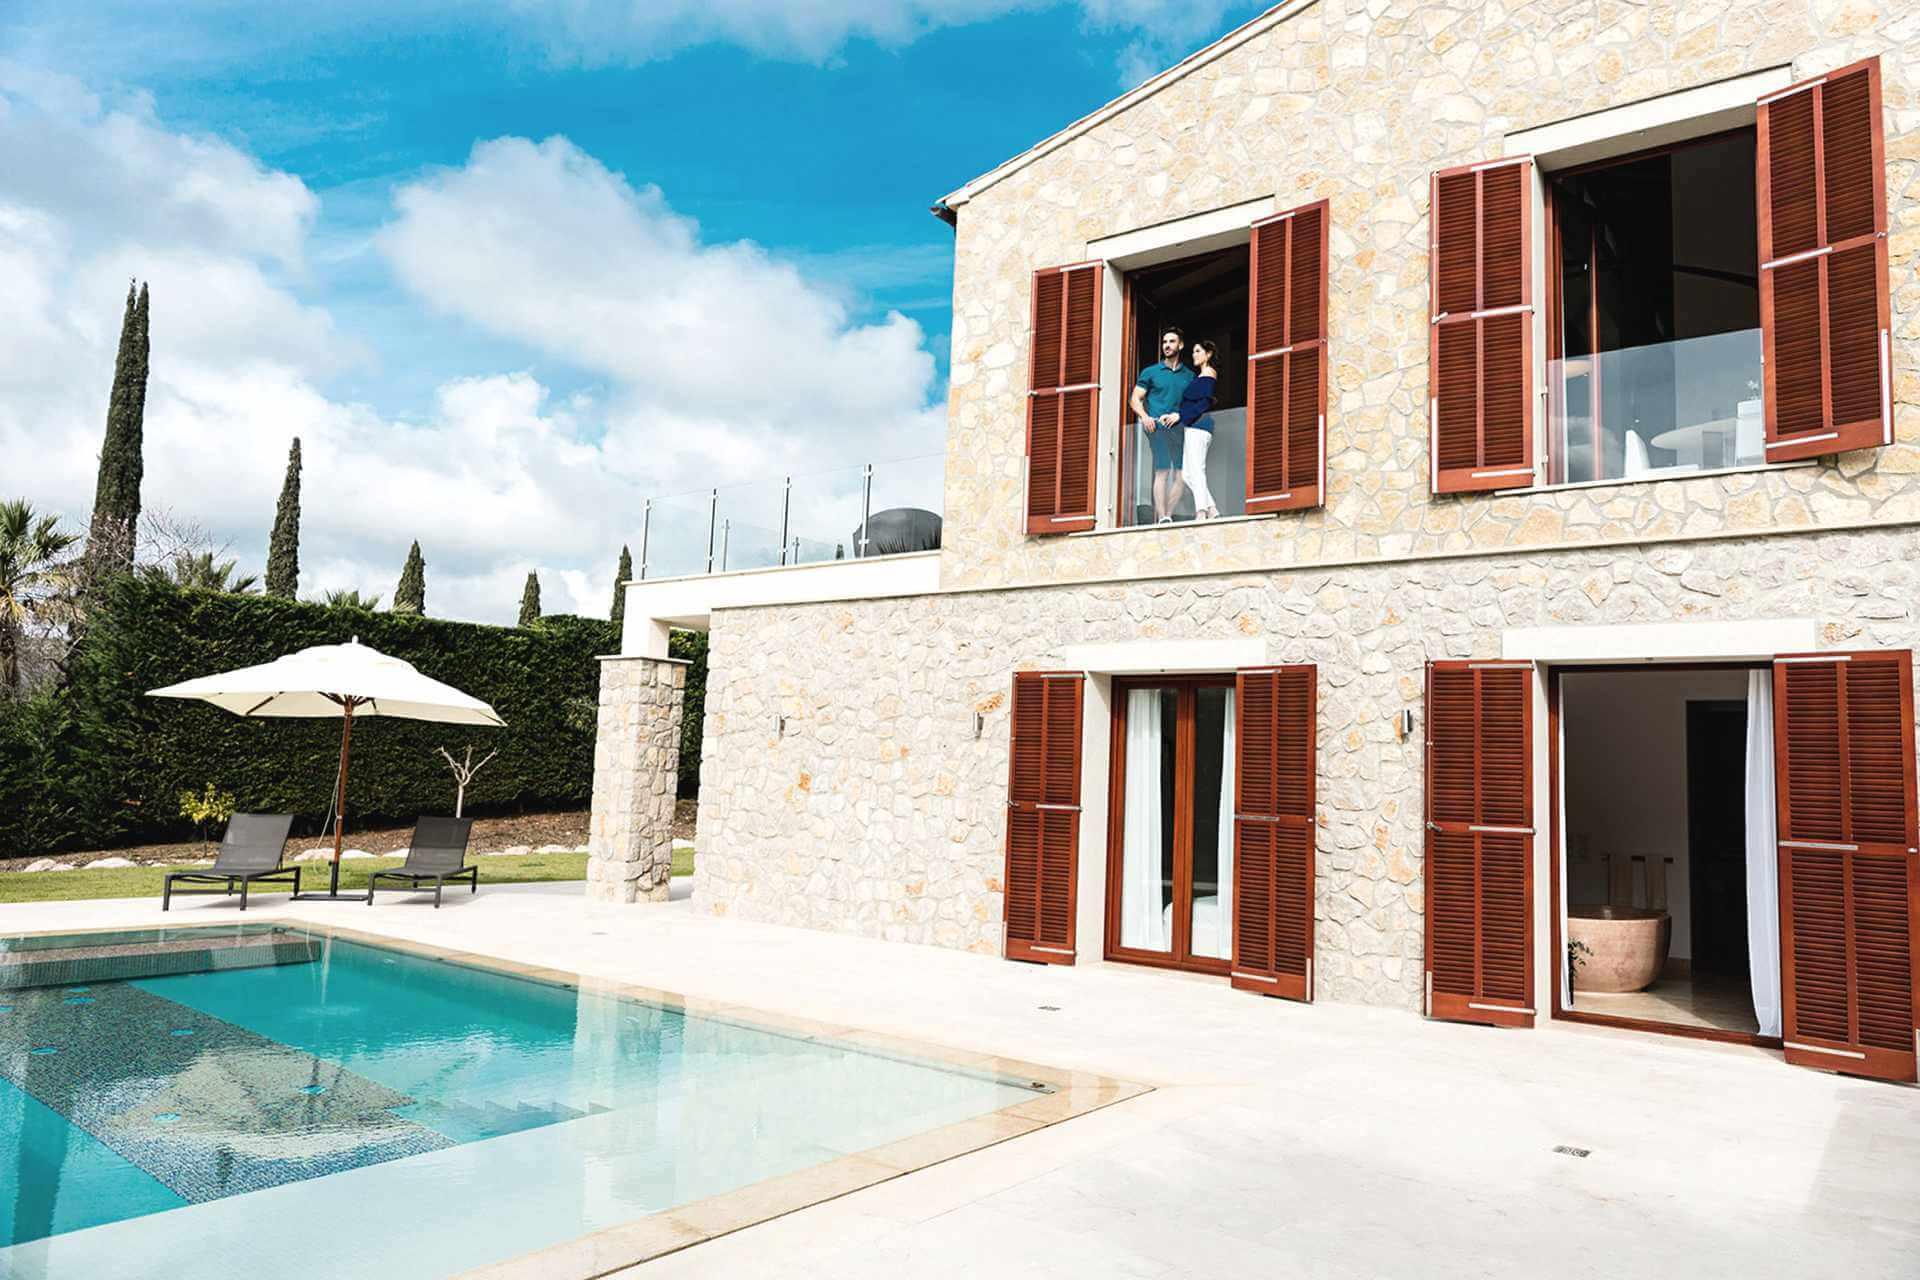 01-326 Design Villa Golfplatz Nordosten Mallorca Bild 3